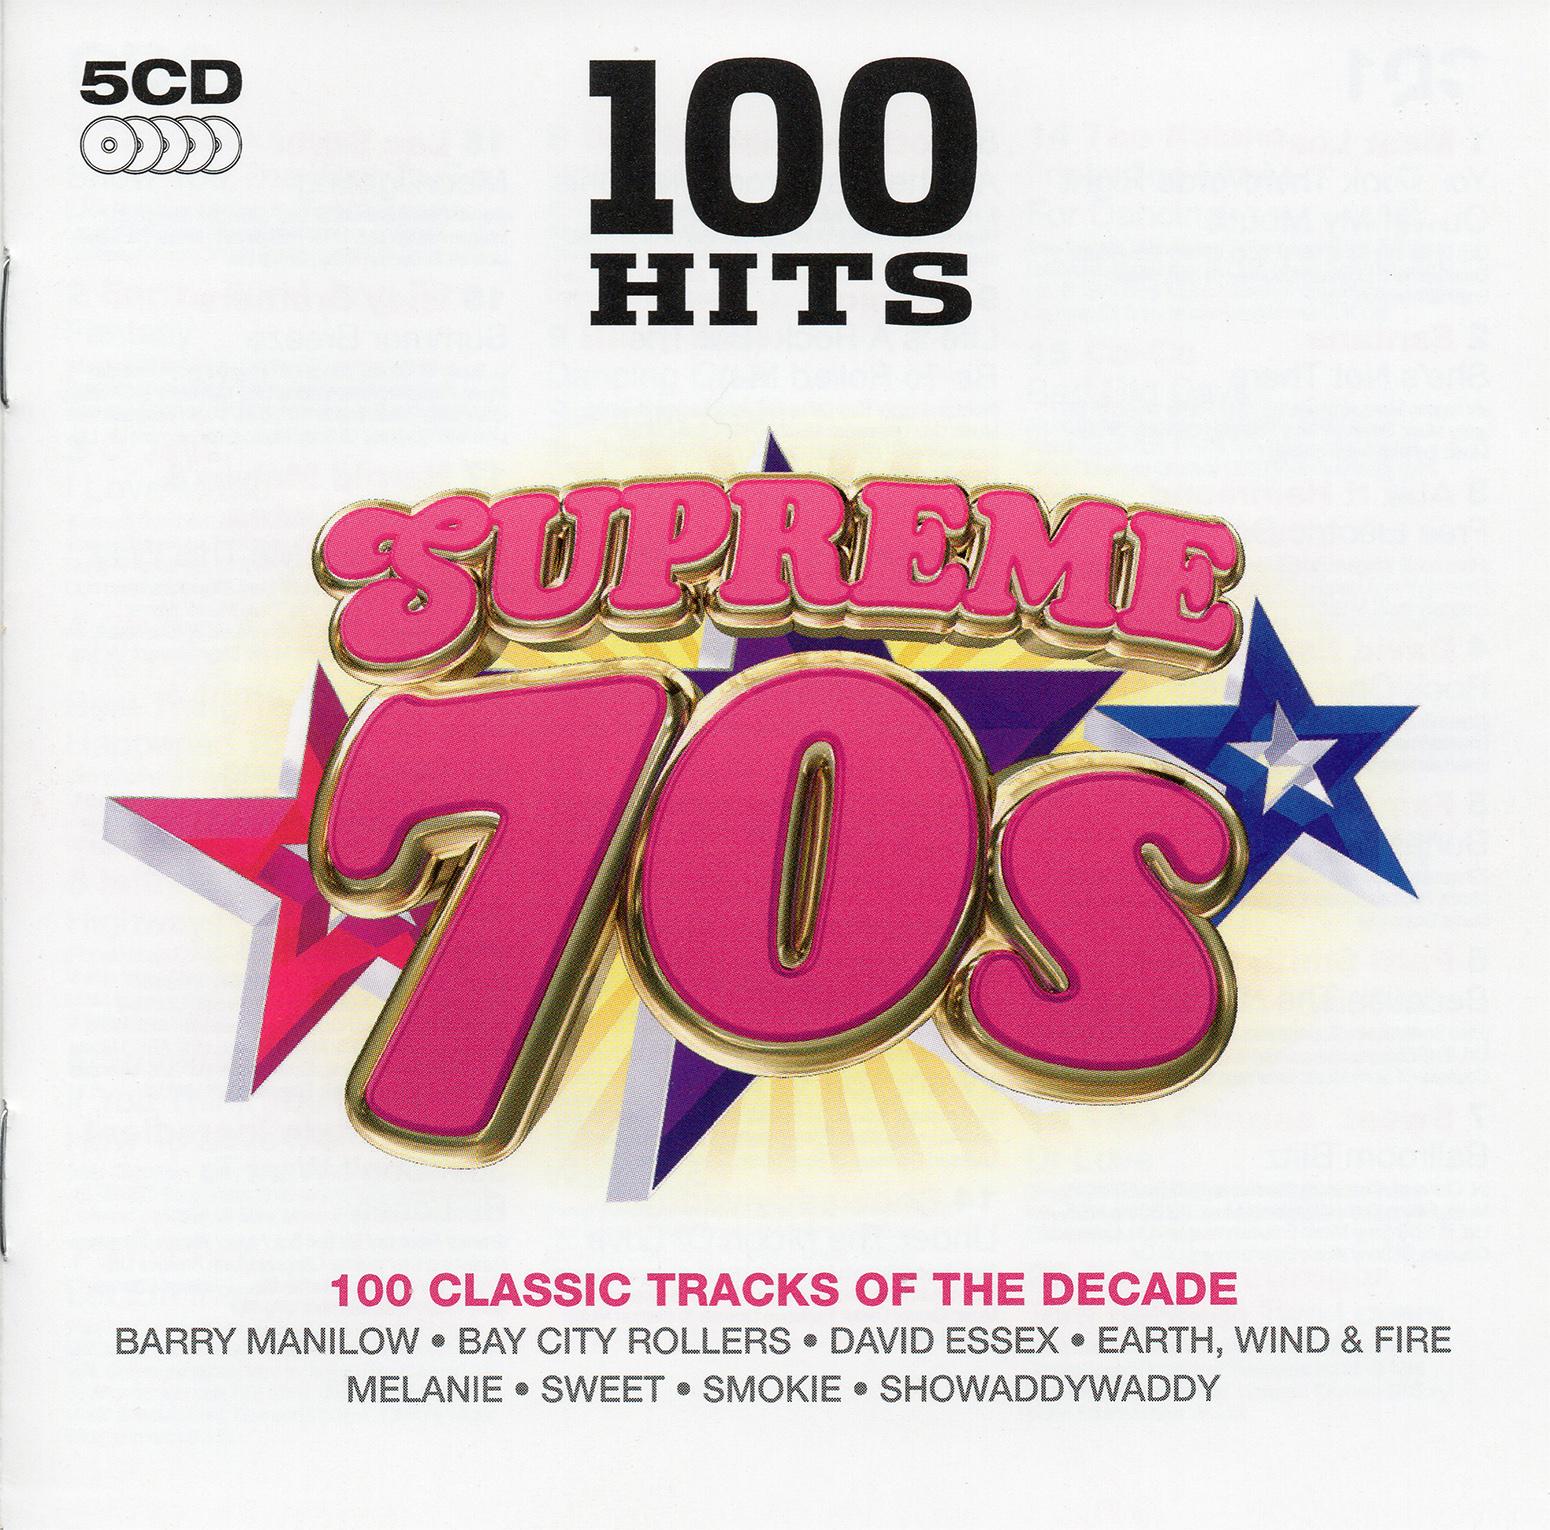 VA - 100 Hits - Supreme 70s [5CD] (2014) Mp3 320 Kbps | DOWNLOAD